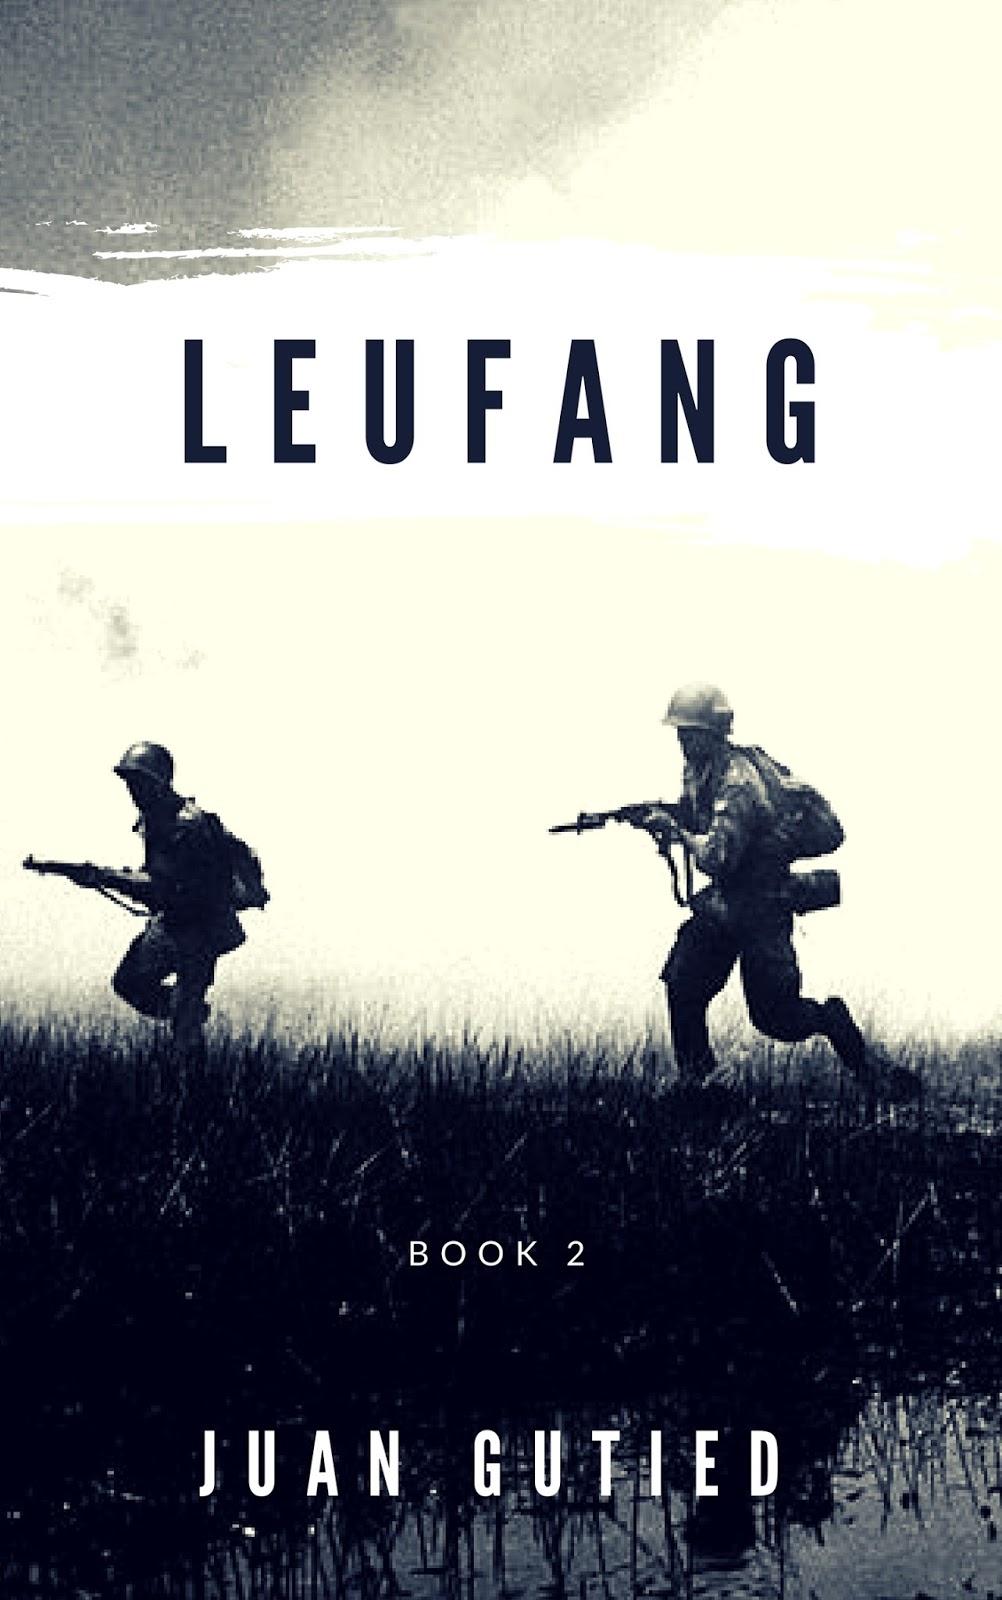 Leufang, Book 2 by Juan Gutied